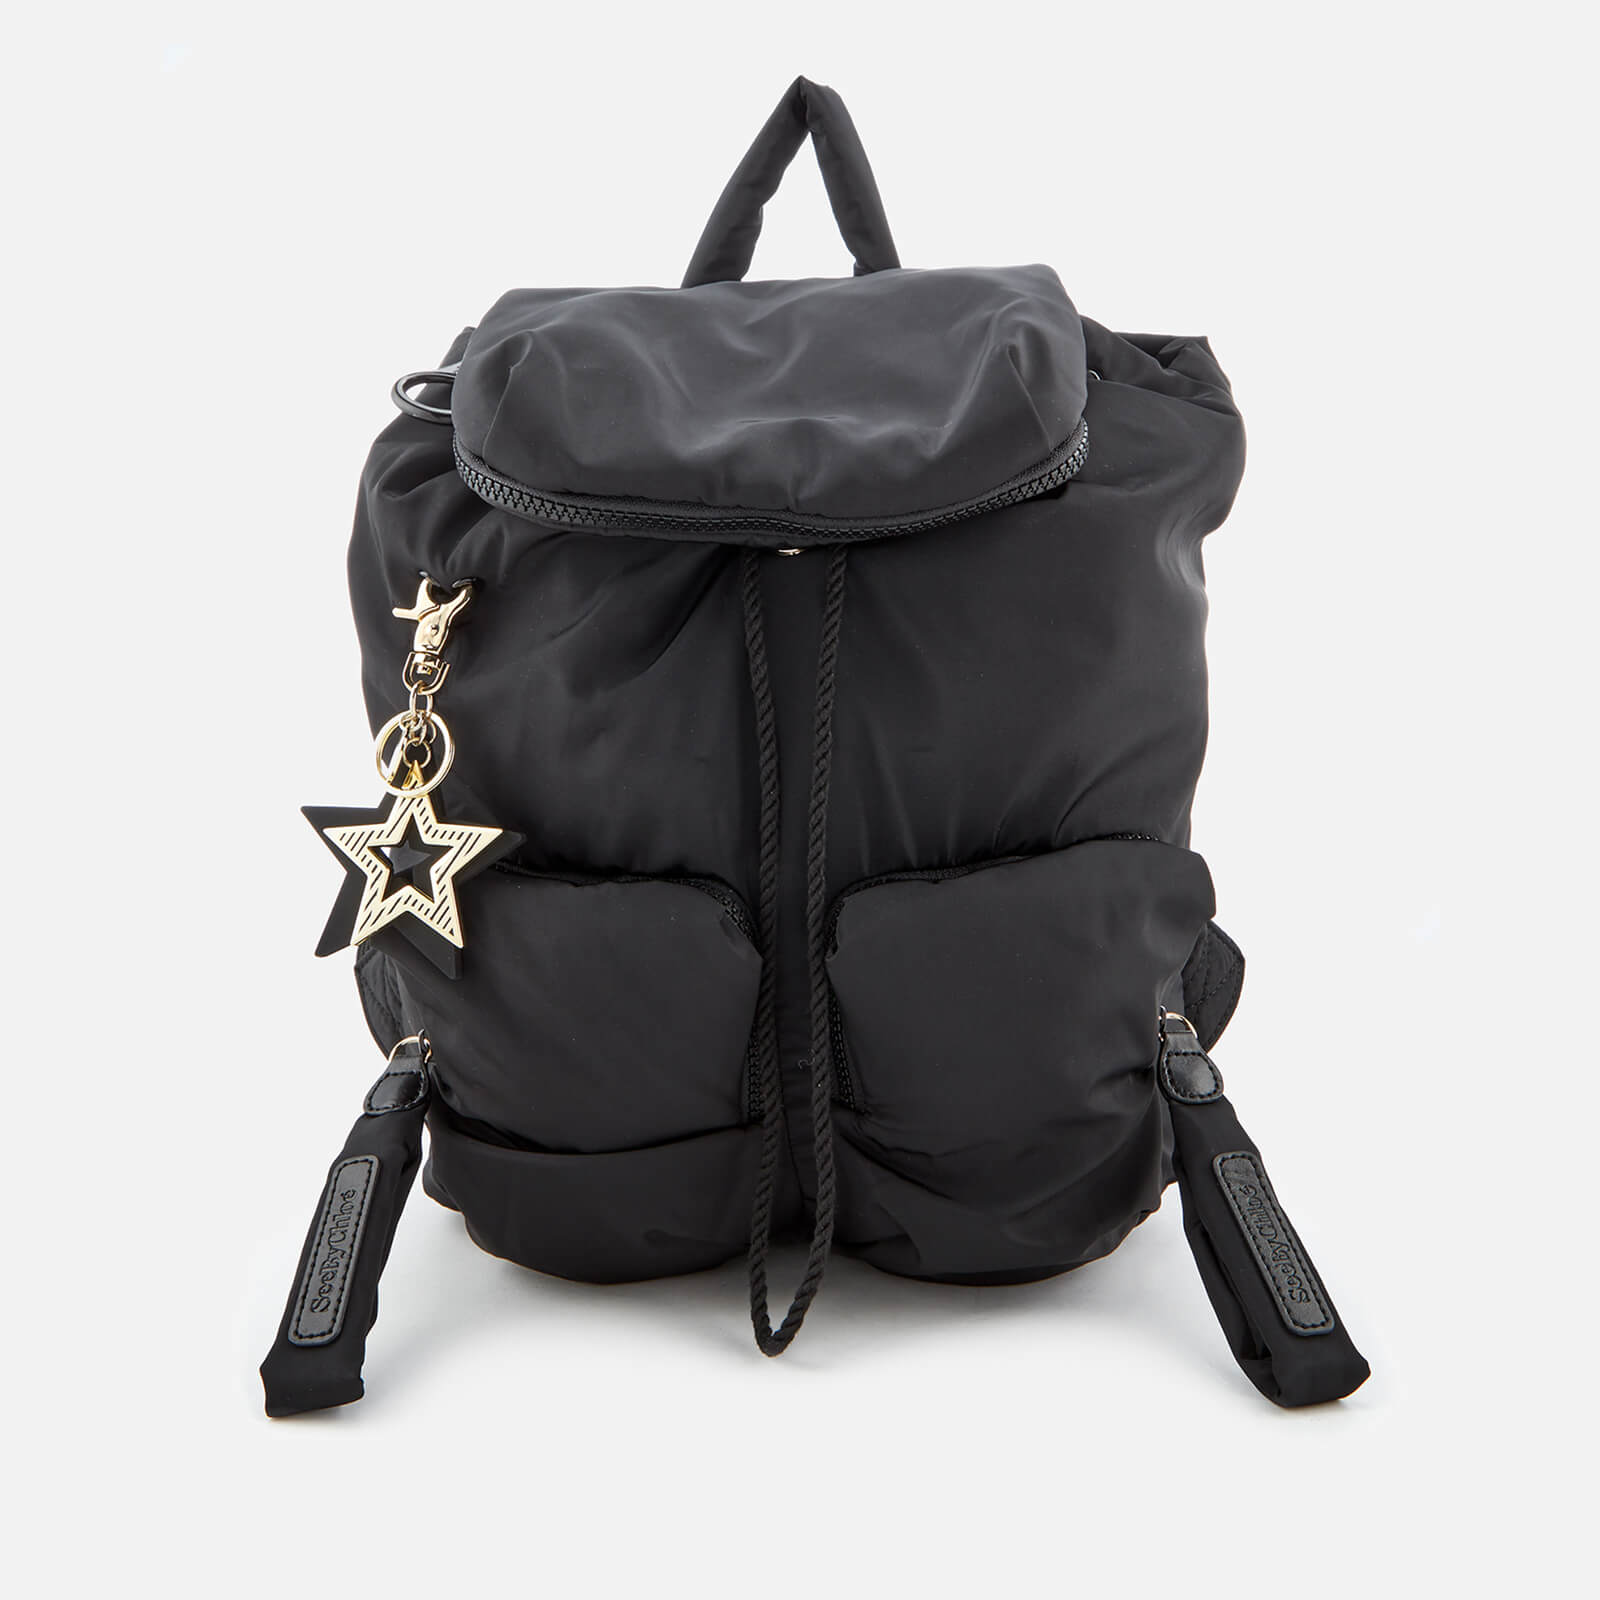 8dfb58fa See By Chloé Women's Joy Rider Nylon Backpack - Black